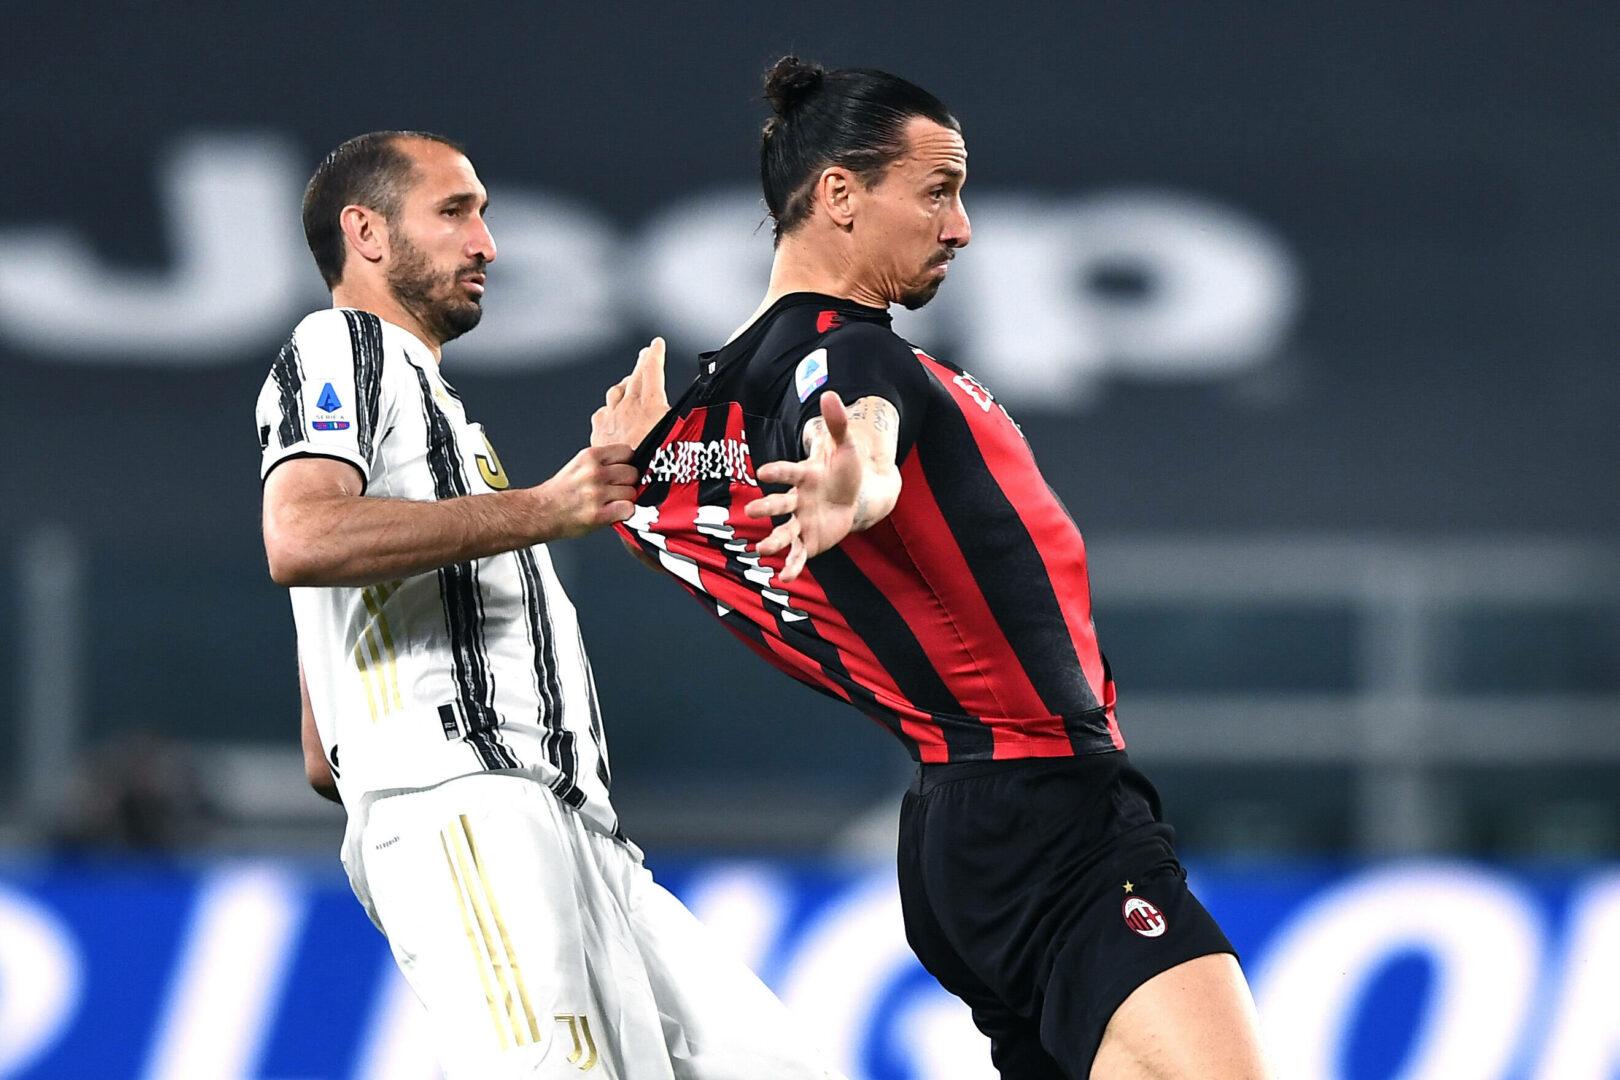 Chiellini (Juve) hält Ibrahimovic (Milan) am Trikot fest